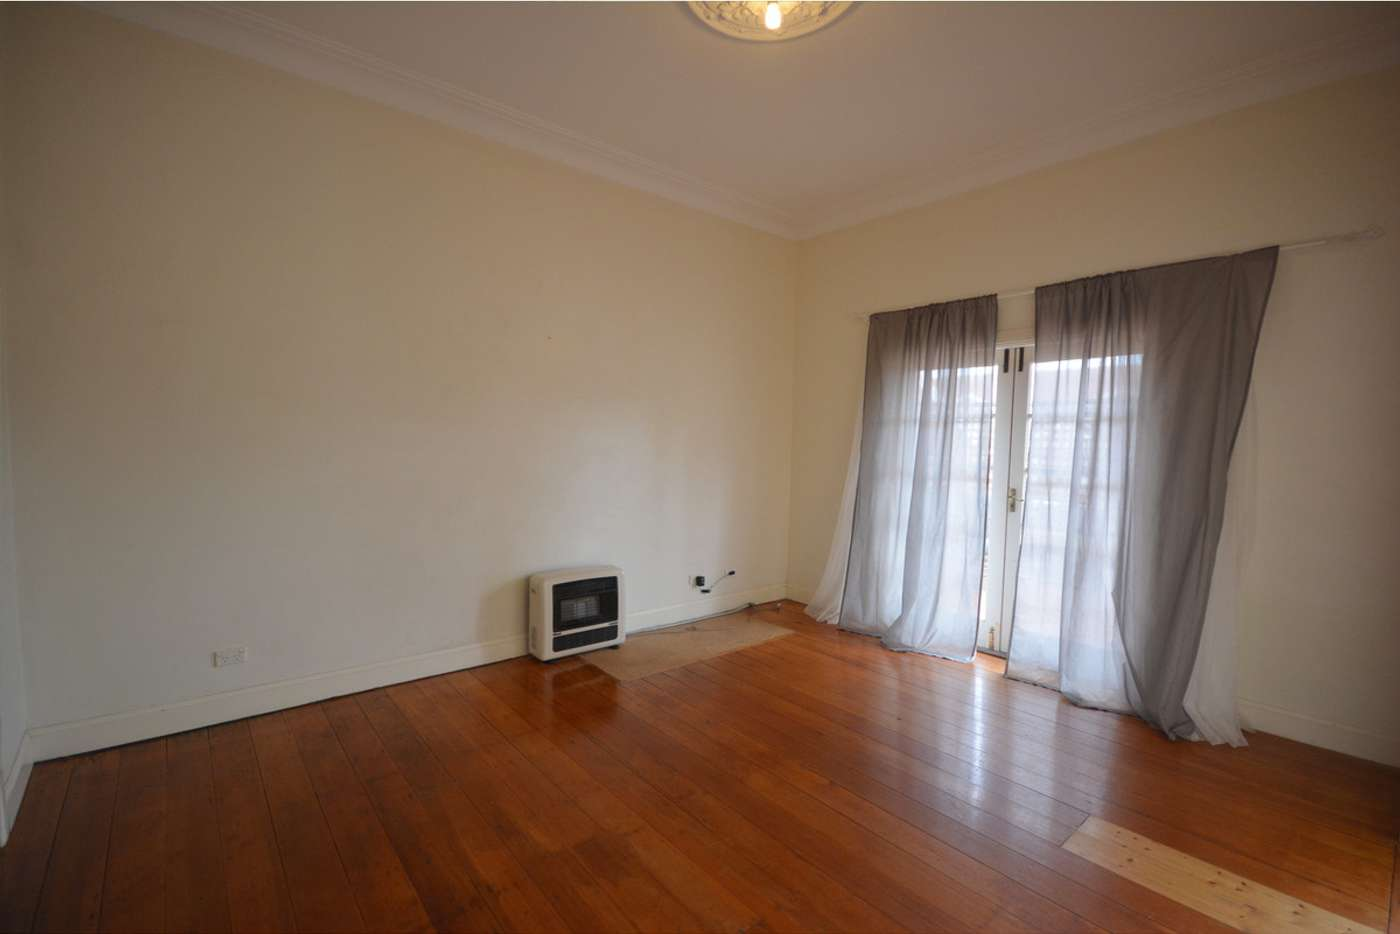 Sixth view of Homely house listing, 1/7-11 Merriwa Street, Katoomba NSW 2780